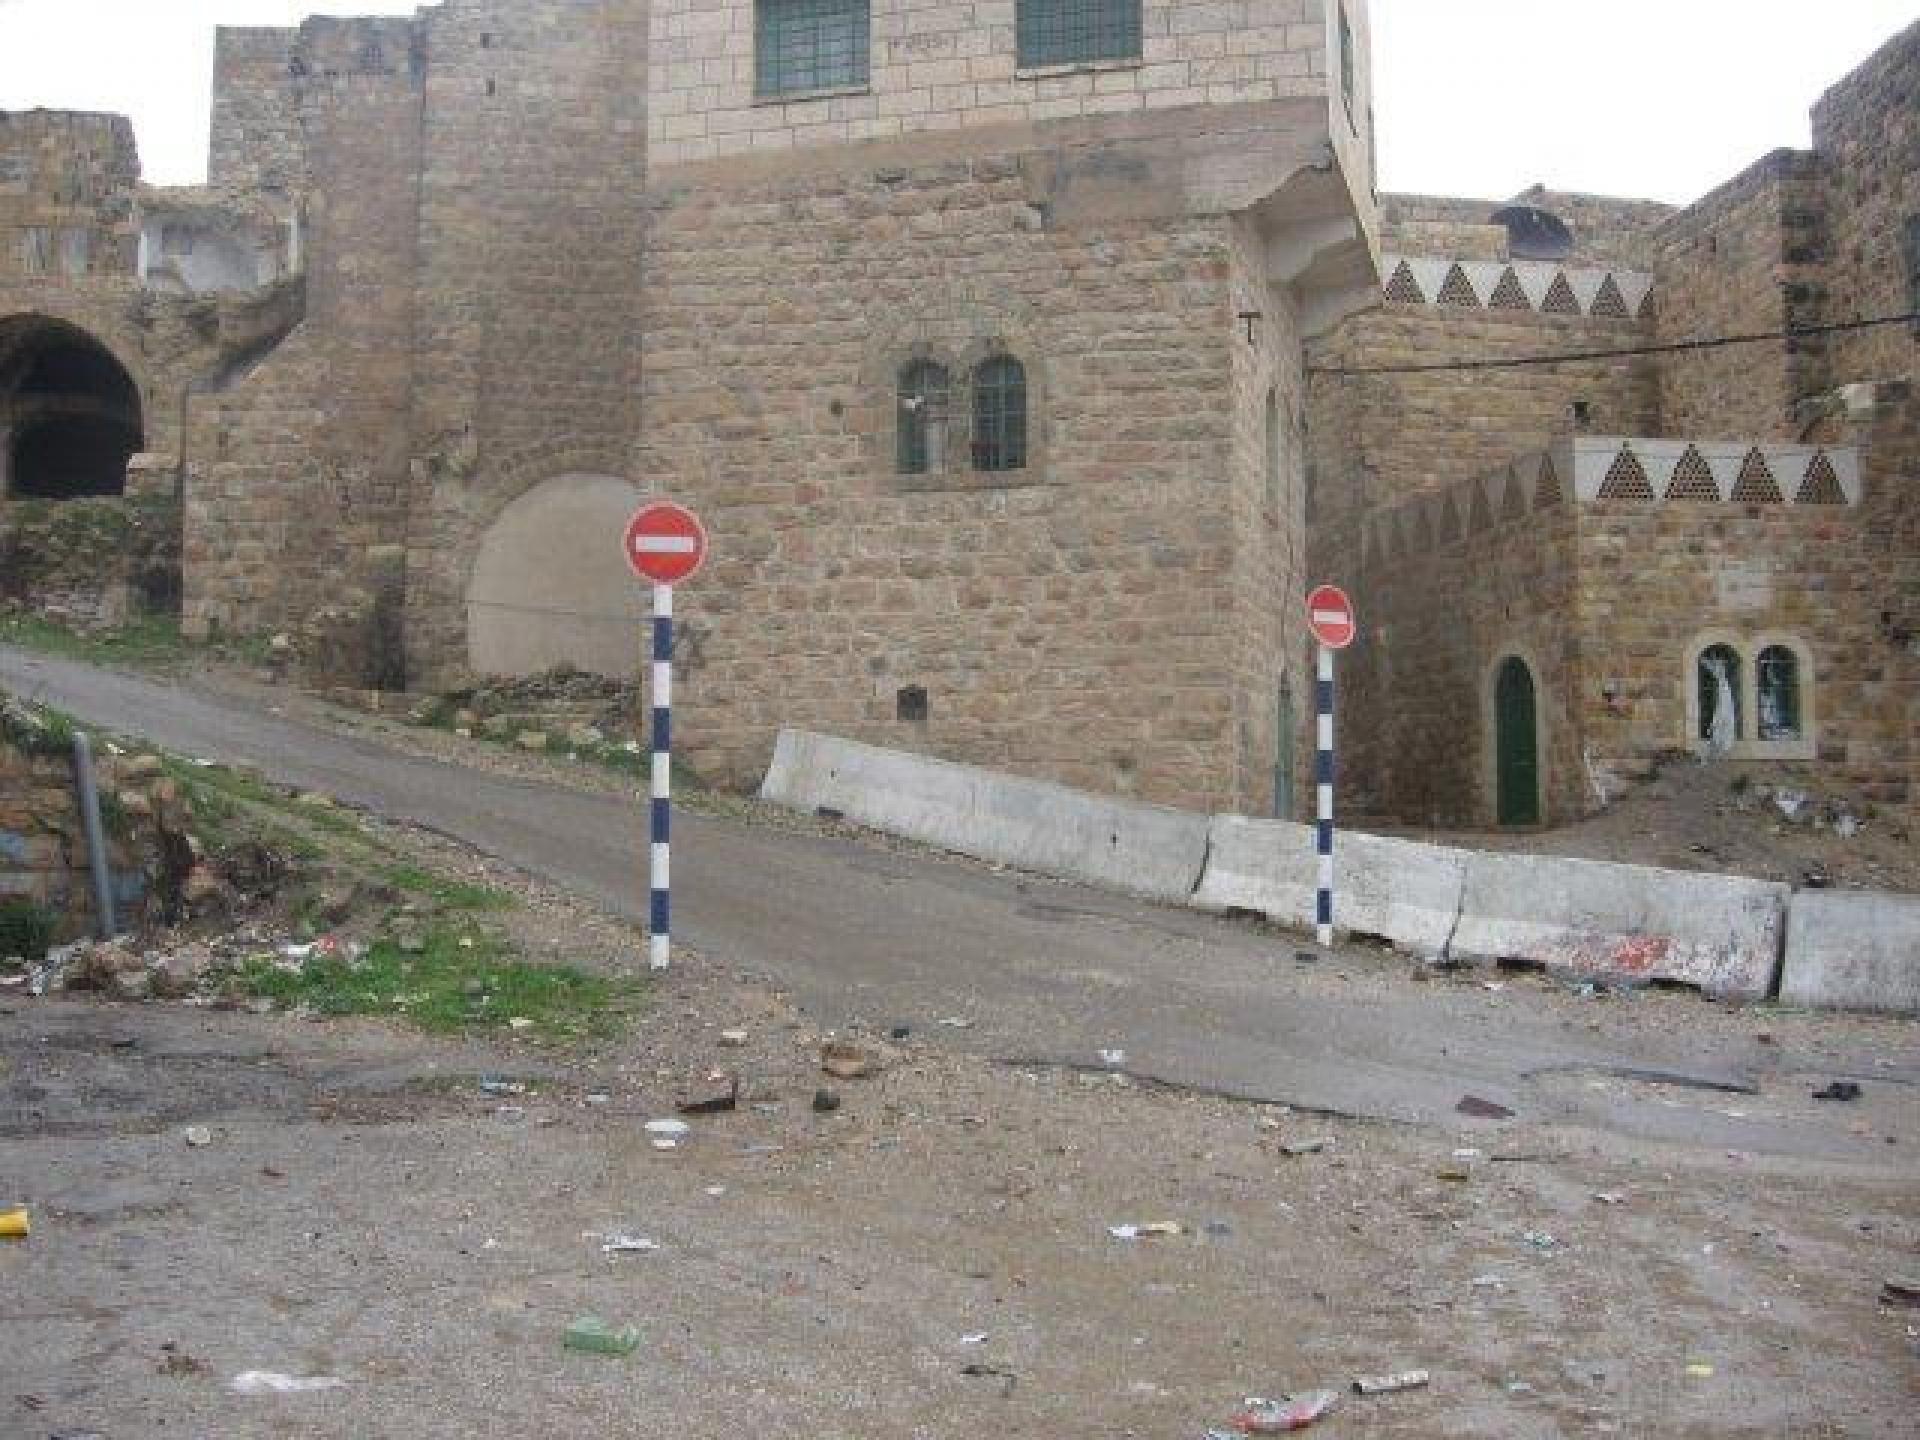 Hebron 16.02.12